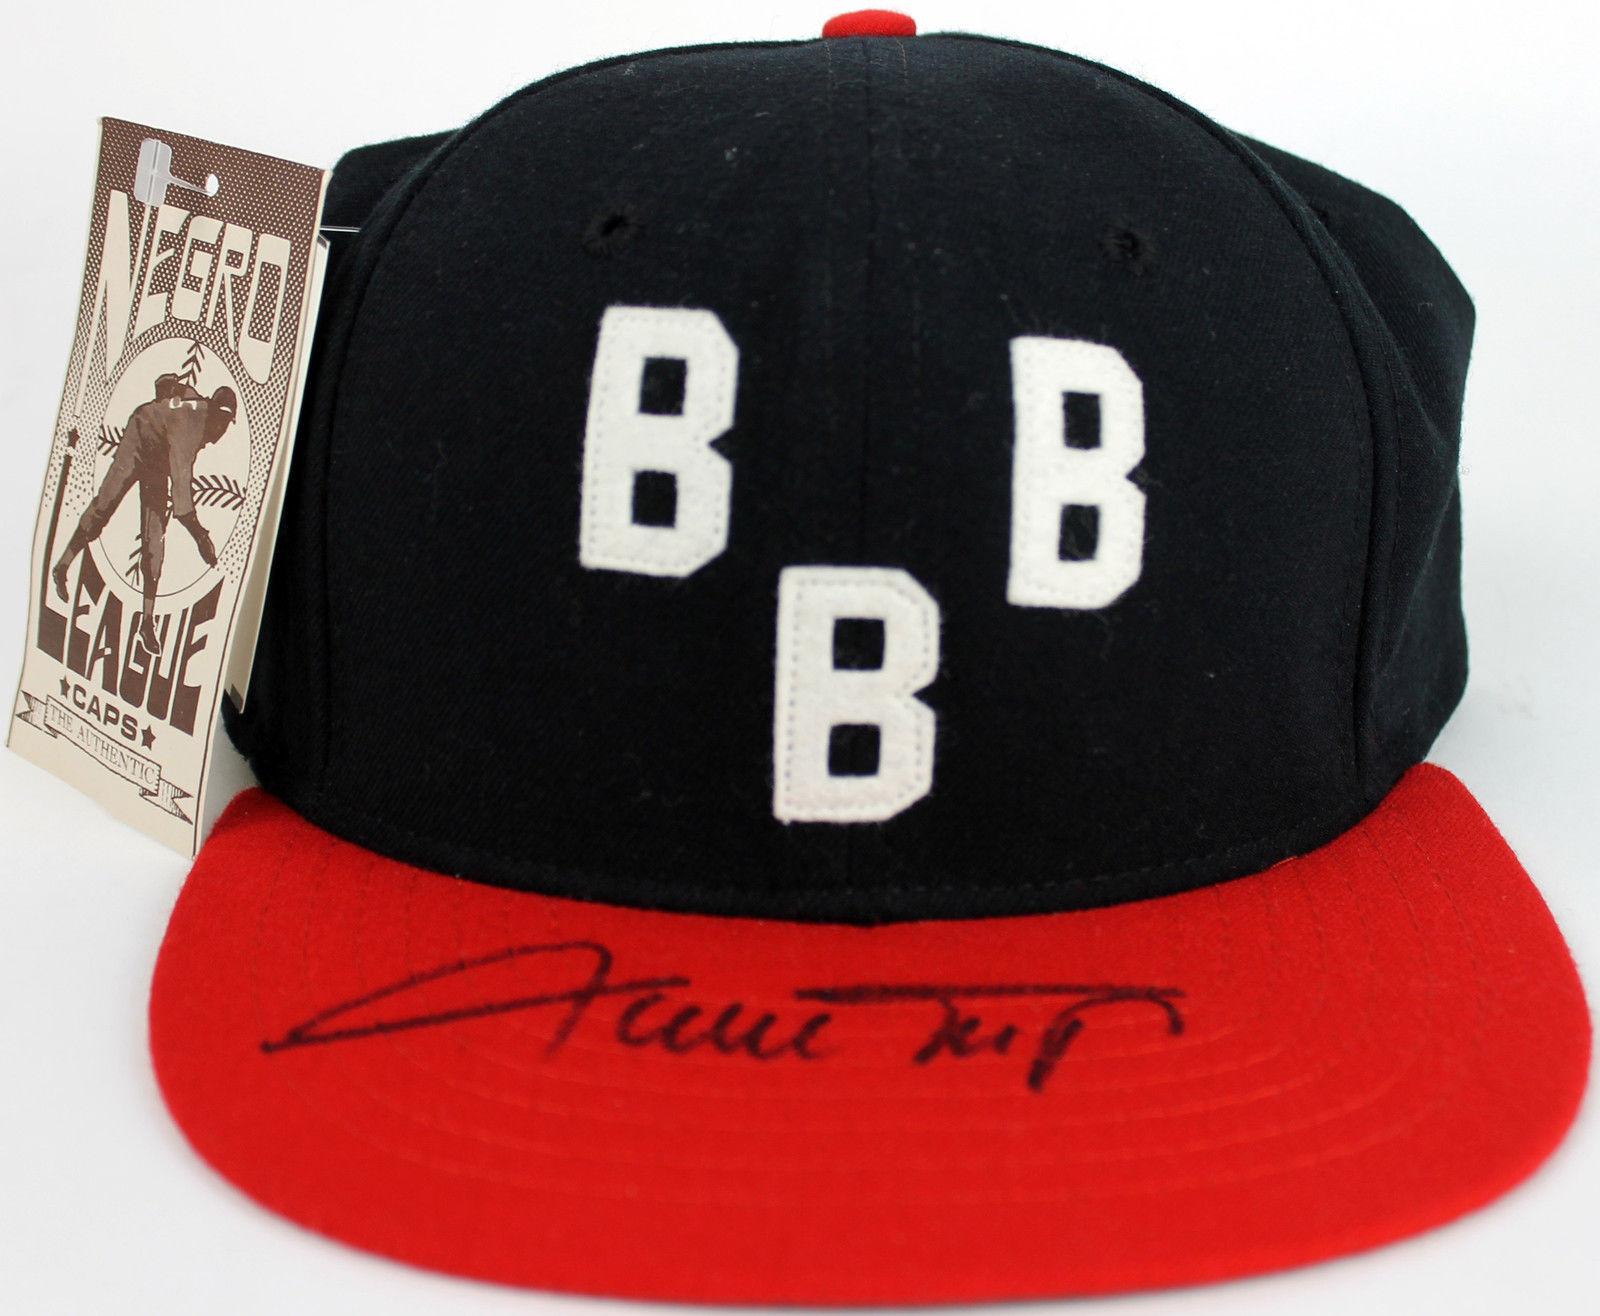 859fb98cf0b Lot Detail - Willie Mays Signed Birmingham Black Barons Baseball Cap ...